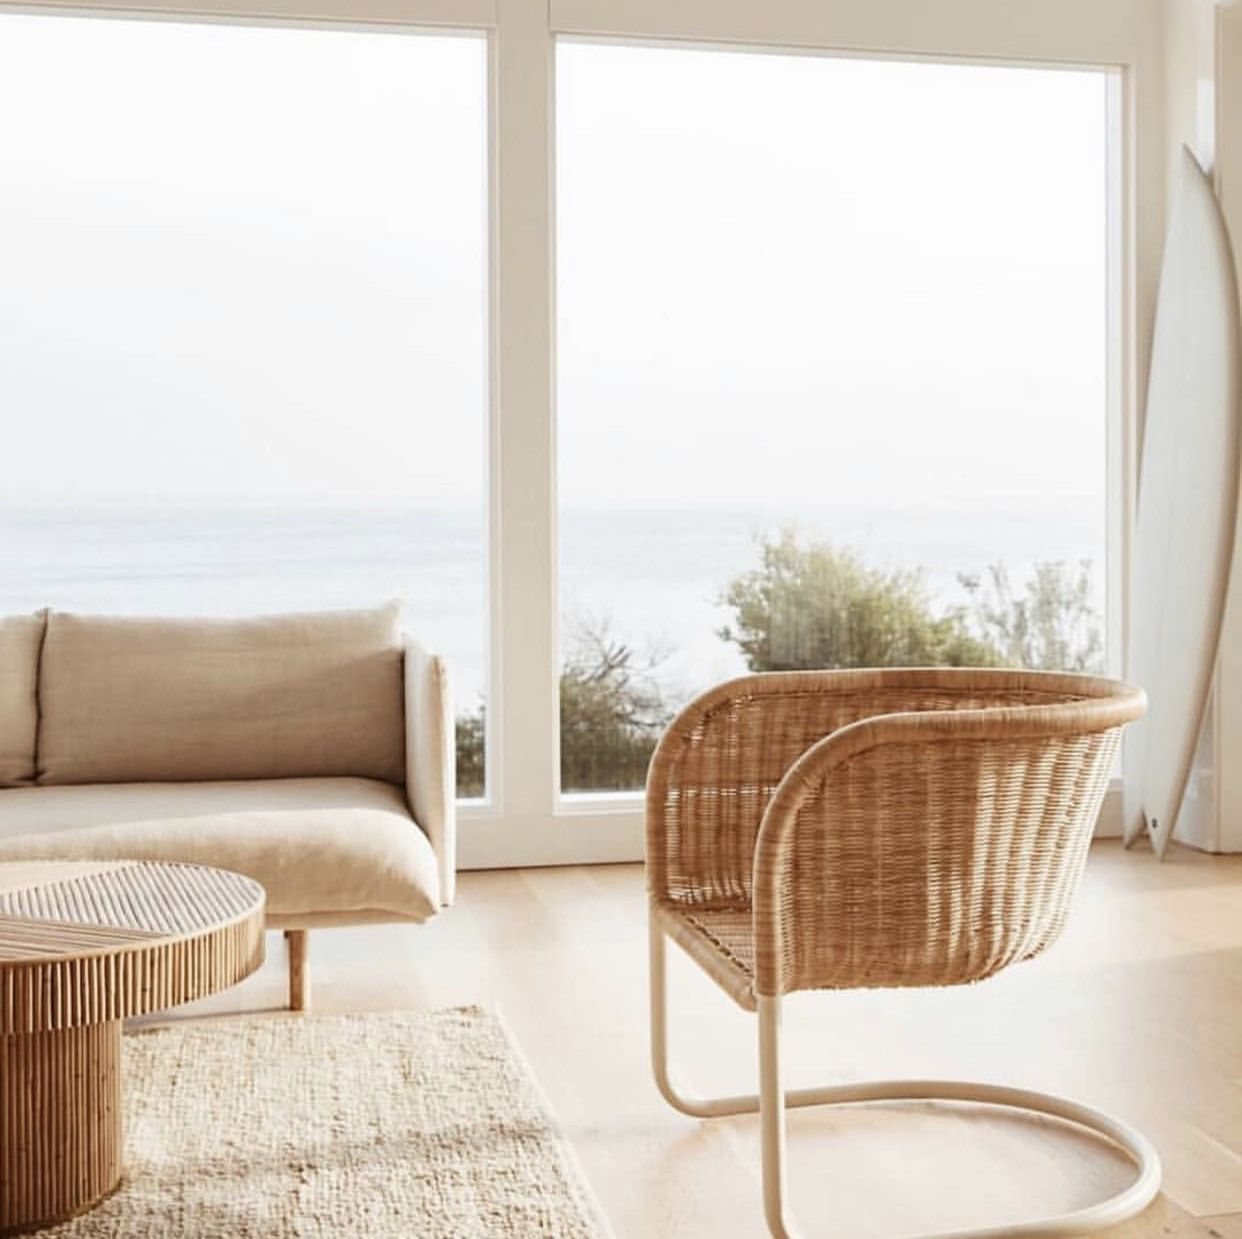 Groovy Luxurybathroomdesignimages Bathroom Decor In 2019 Machost Co Dining Chair Design Ideas Machostcouk